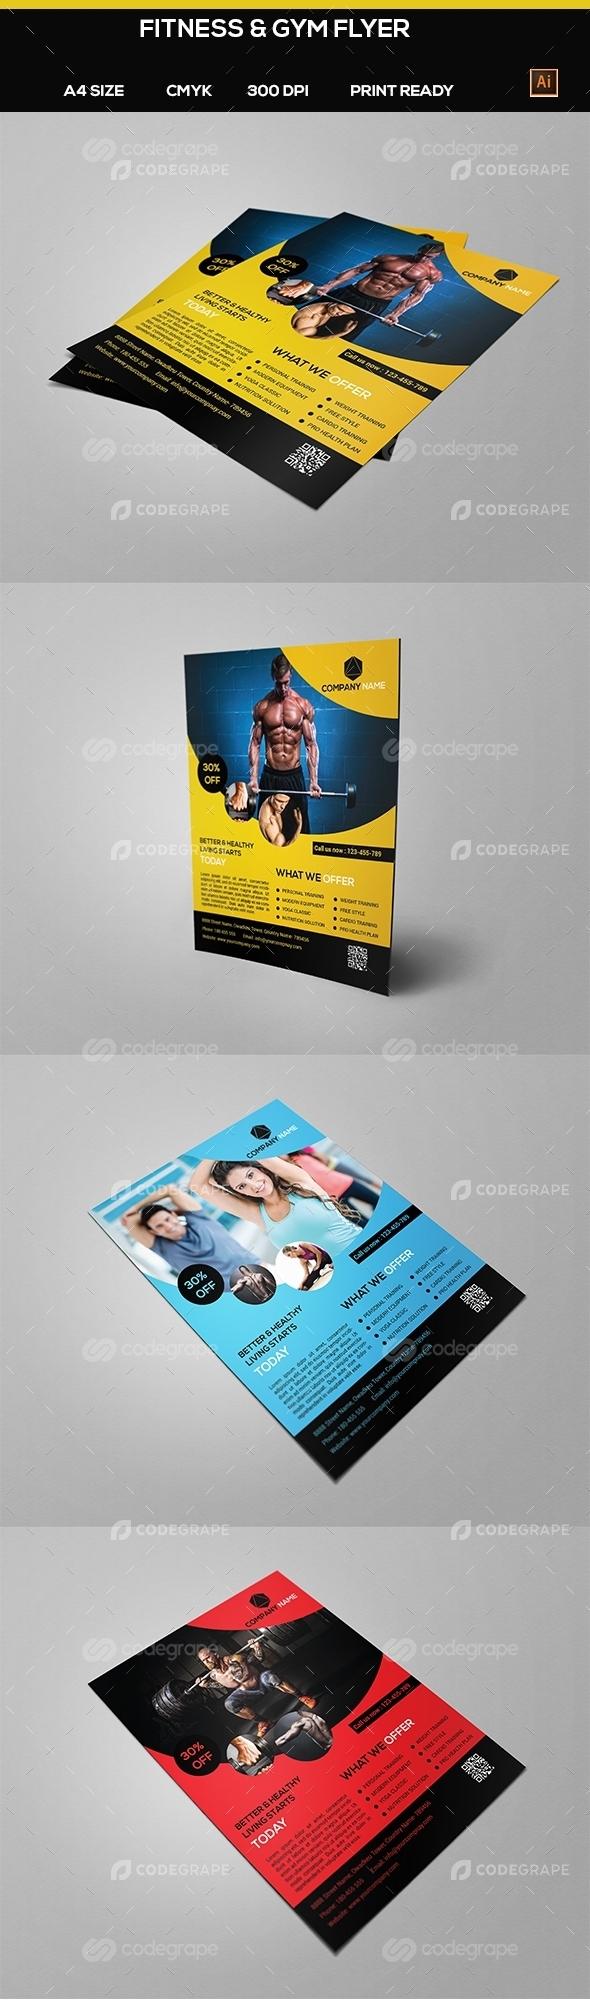 Fitness & Gym flyer